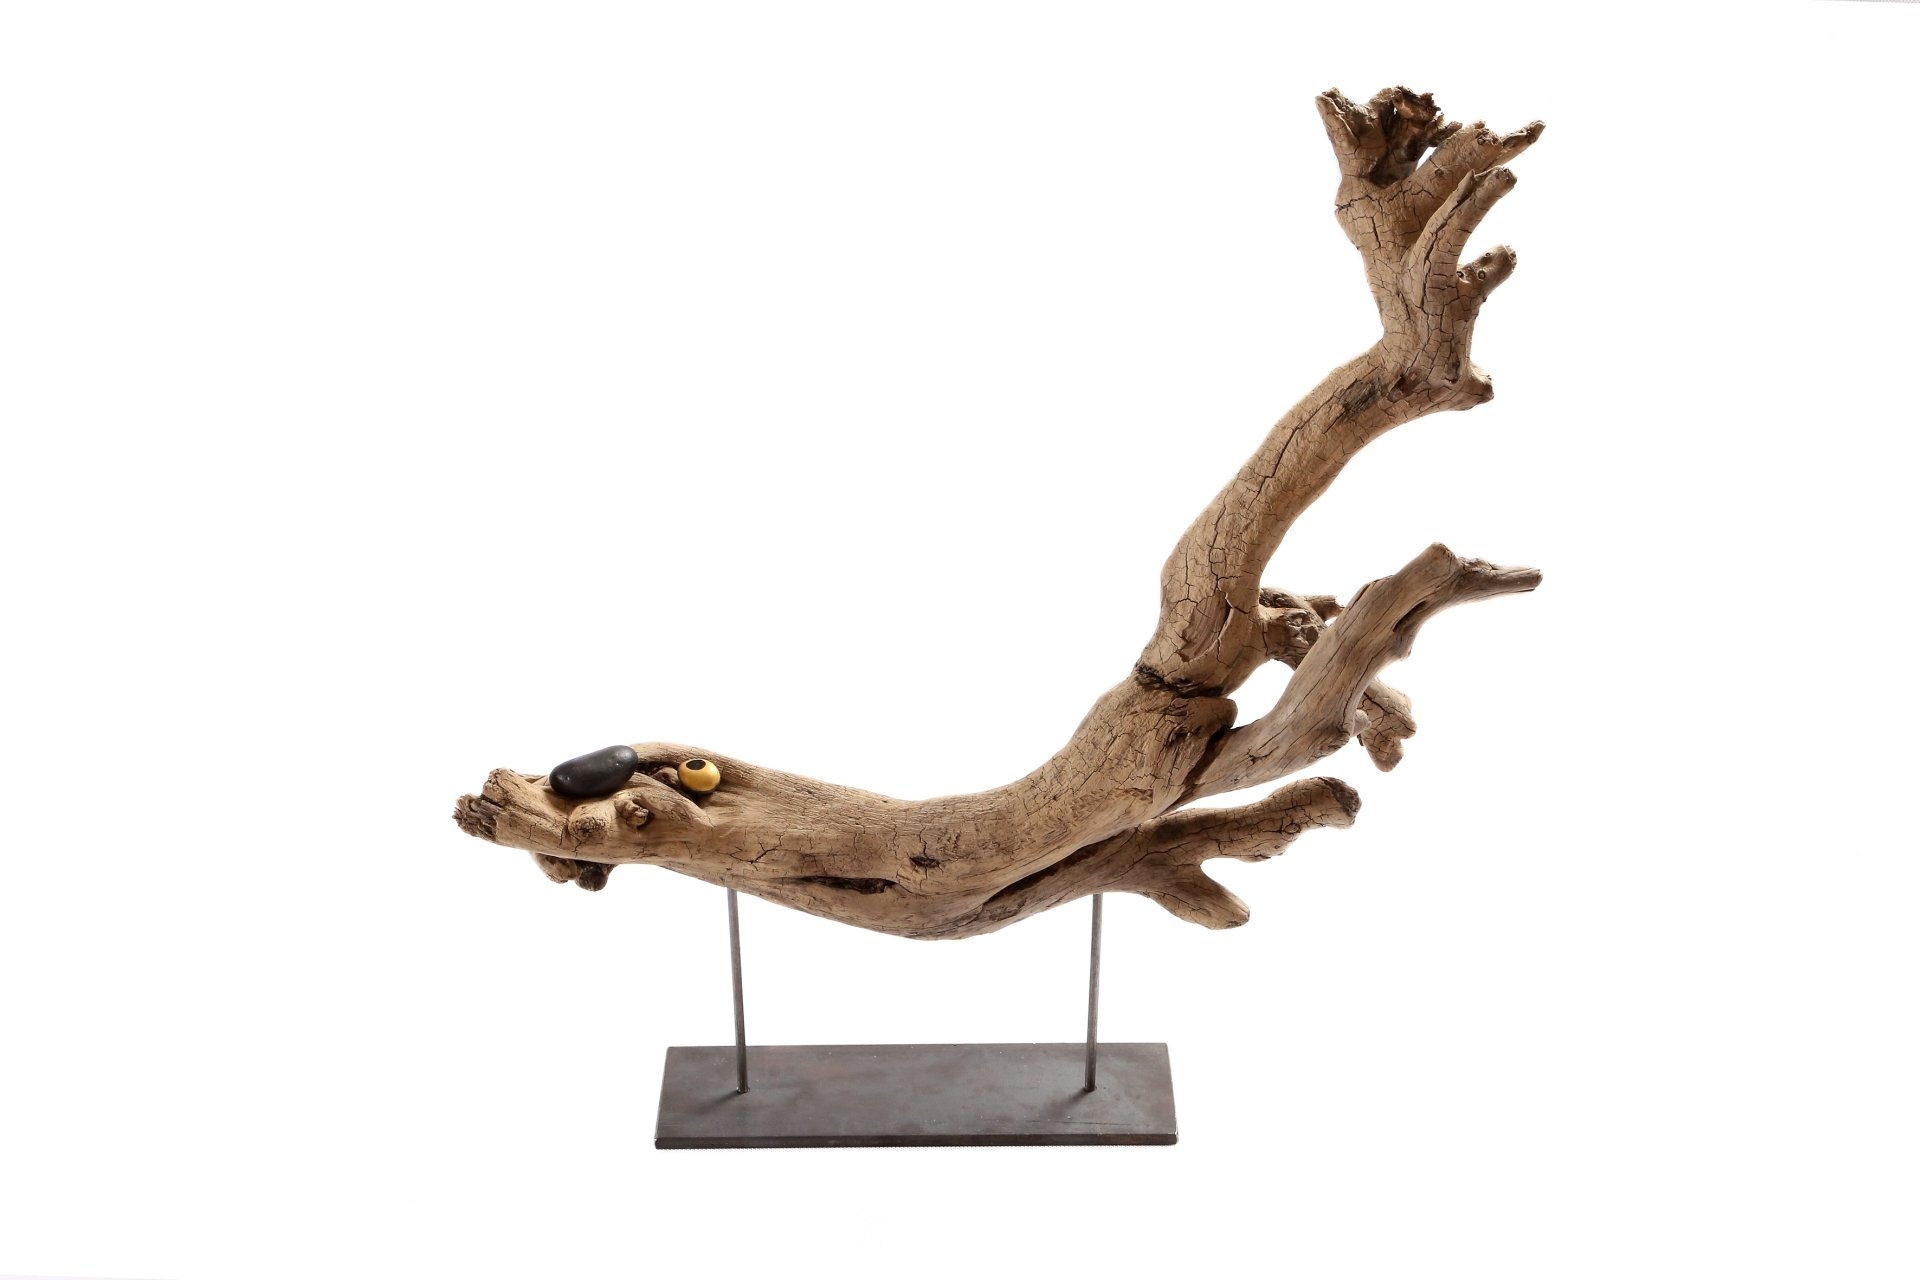 Große Treibholz Skulptur